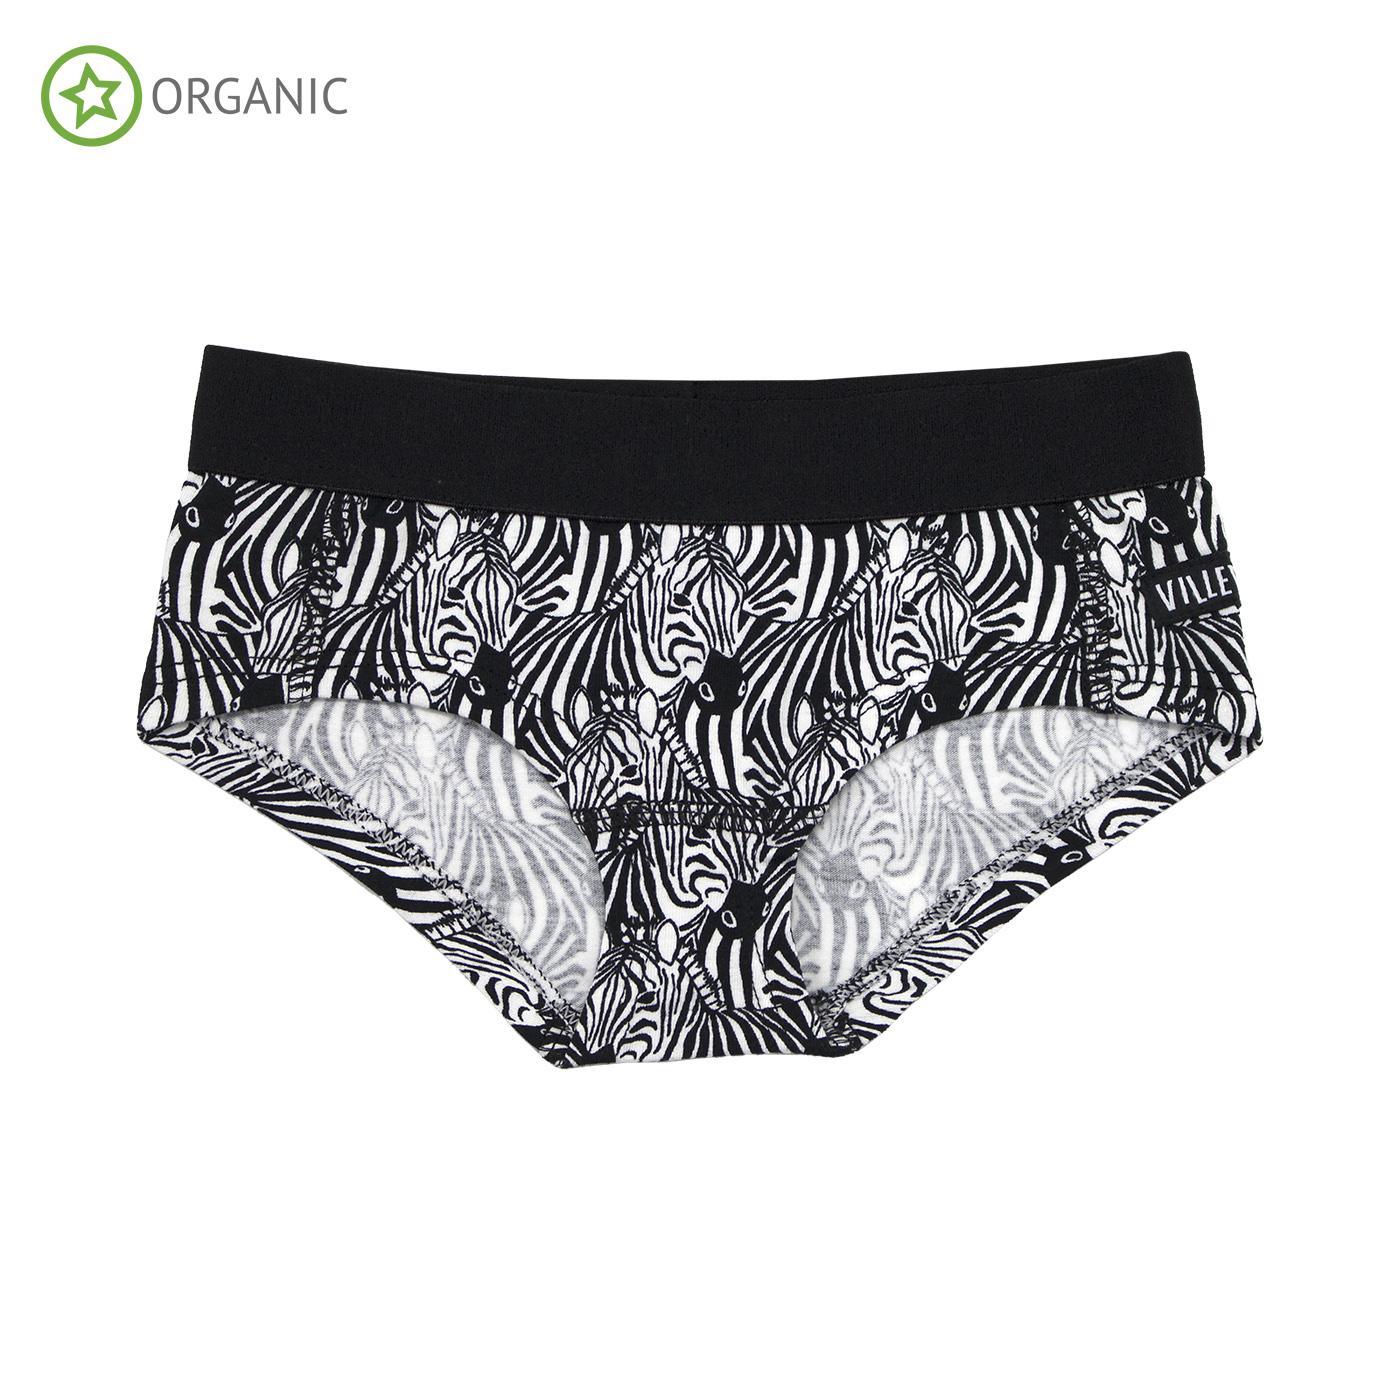 5bcf47d1dee332 Villervalla organic cotton knickers – Zebra | Uni and Jack